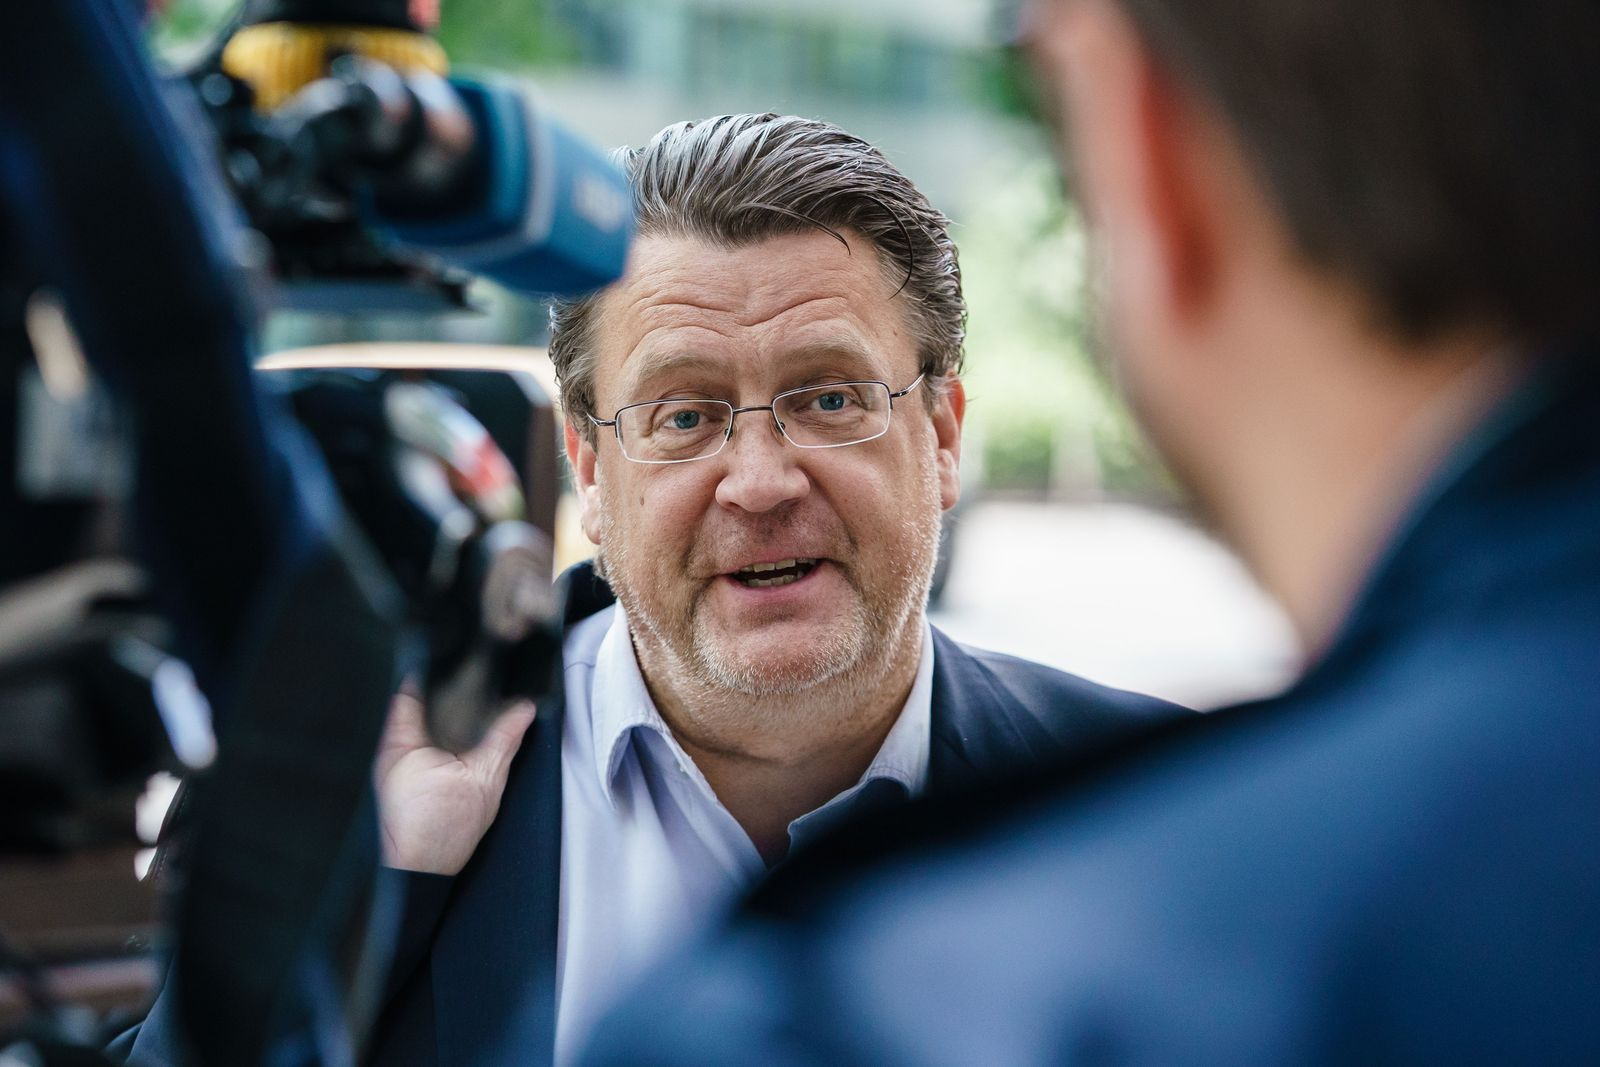 AfD chair board discusses membership of Andreas Kalbitz, Berlin, Germany - 15 May 2020